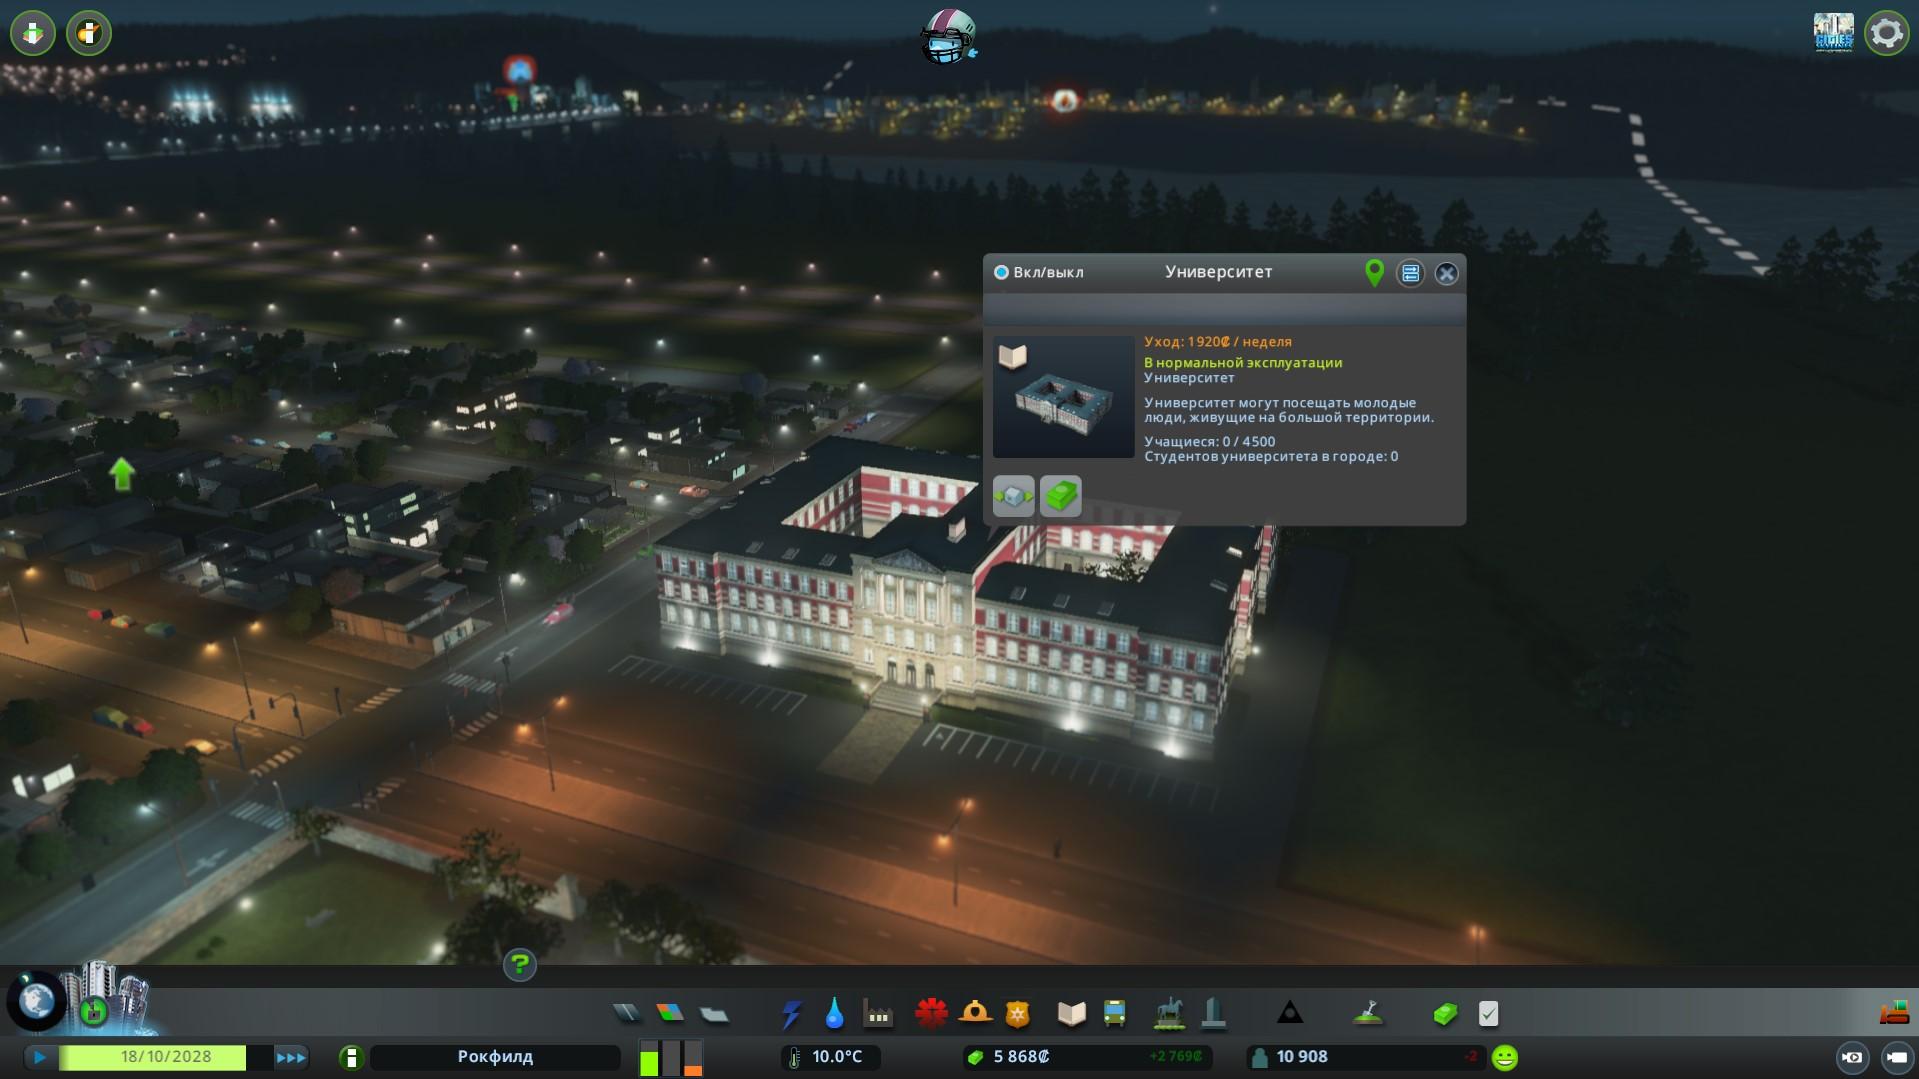 Университет cities skylines